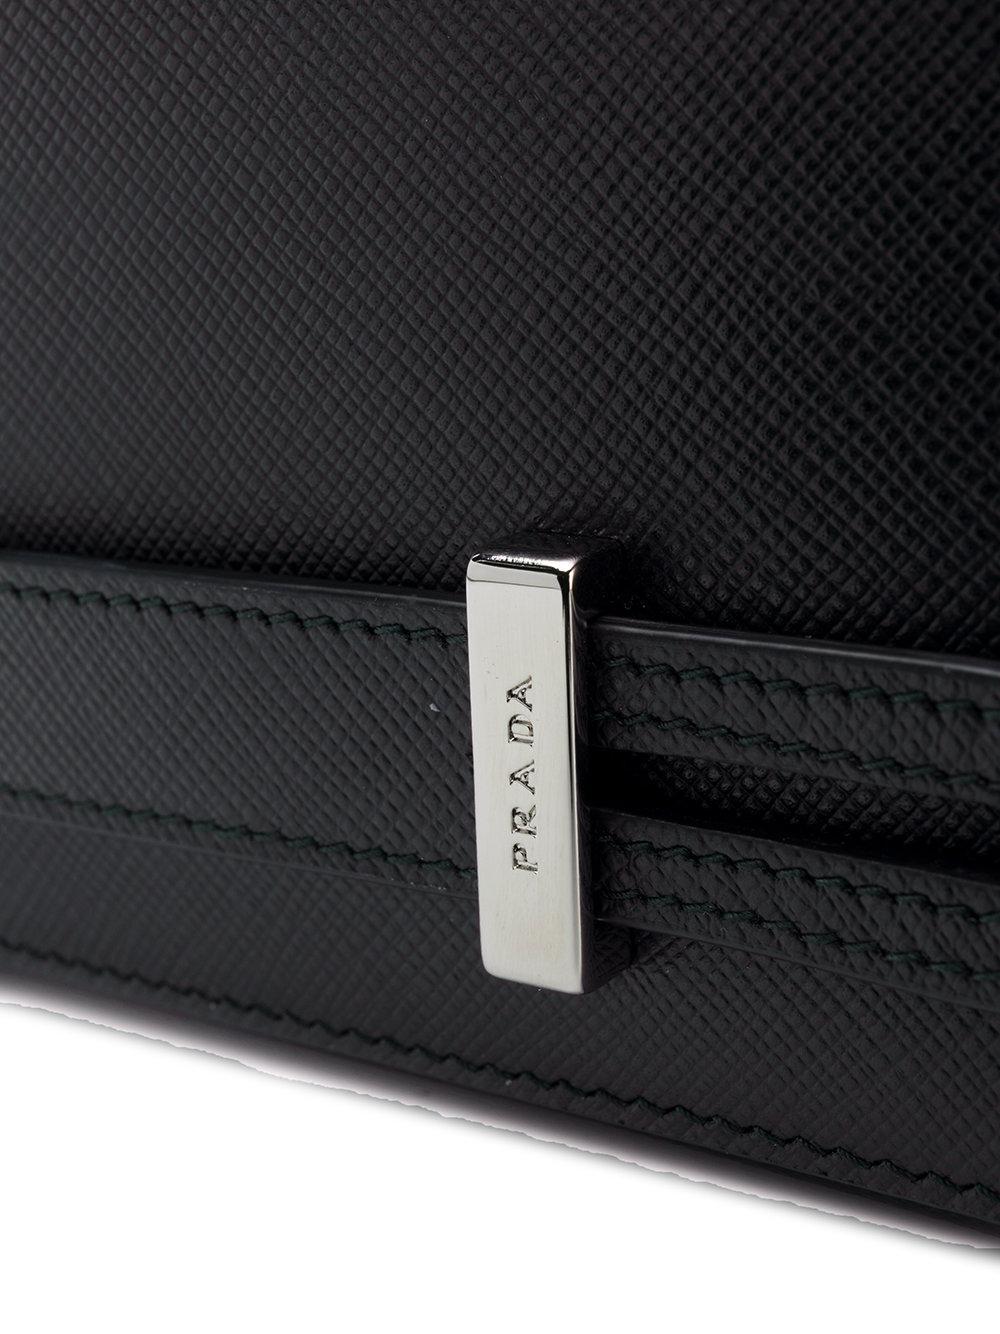 959eaed76625 Prada Hand-strap Clutch in Black for Men - Lyst